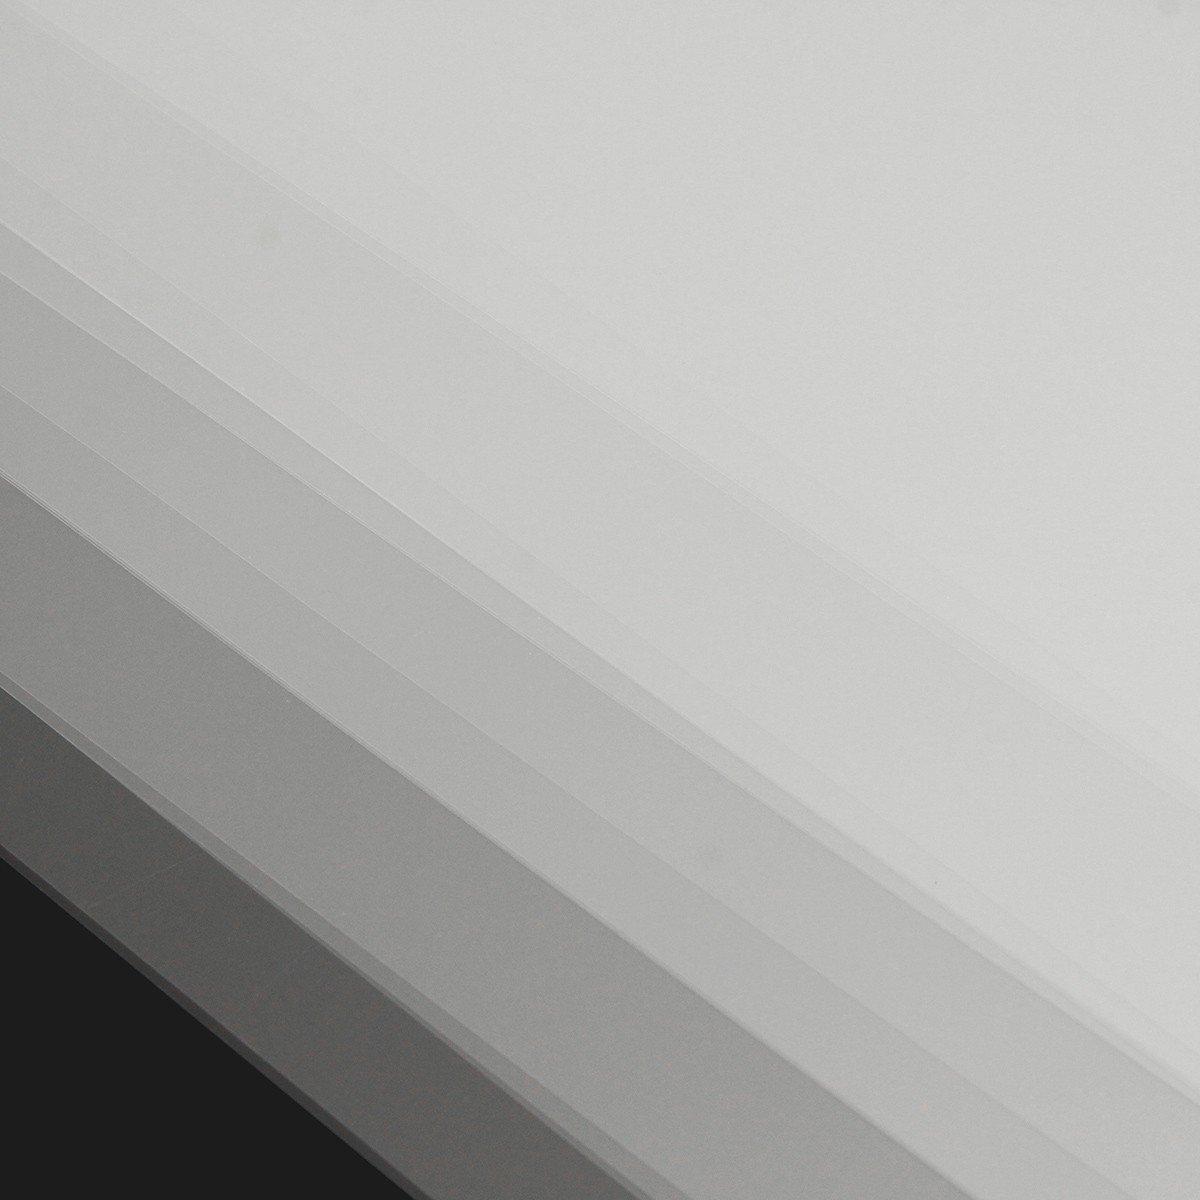 RanDal 20Pcs A4 Inkjet Film Screen Printing Paper Transparent Pcb Print Stencil